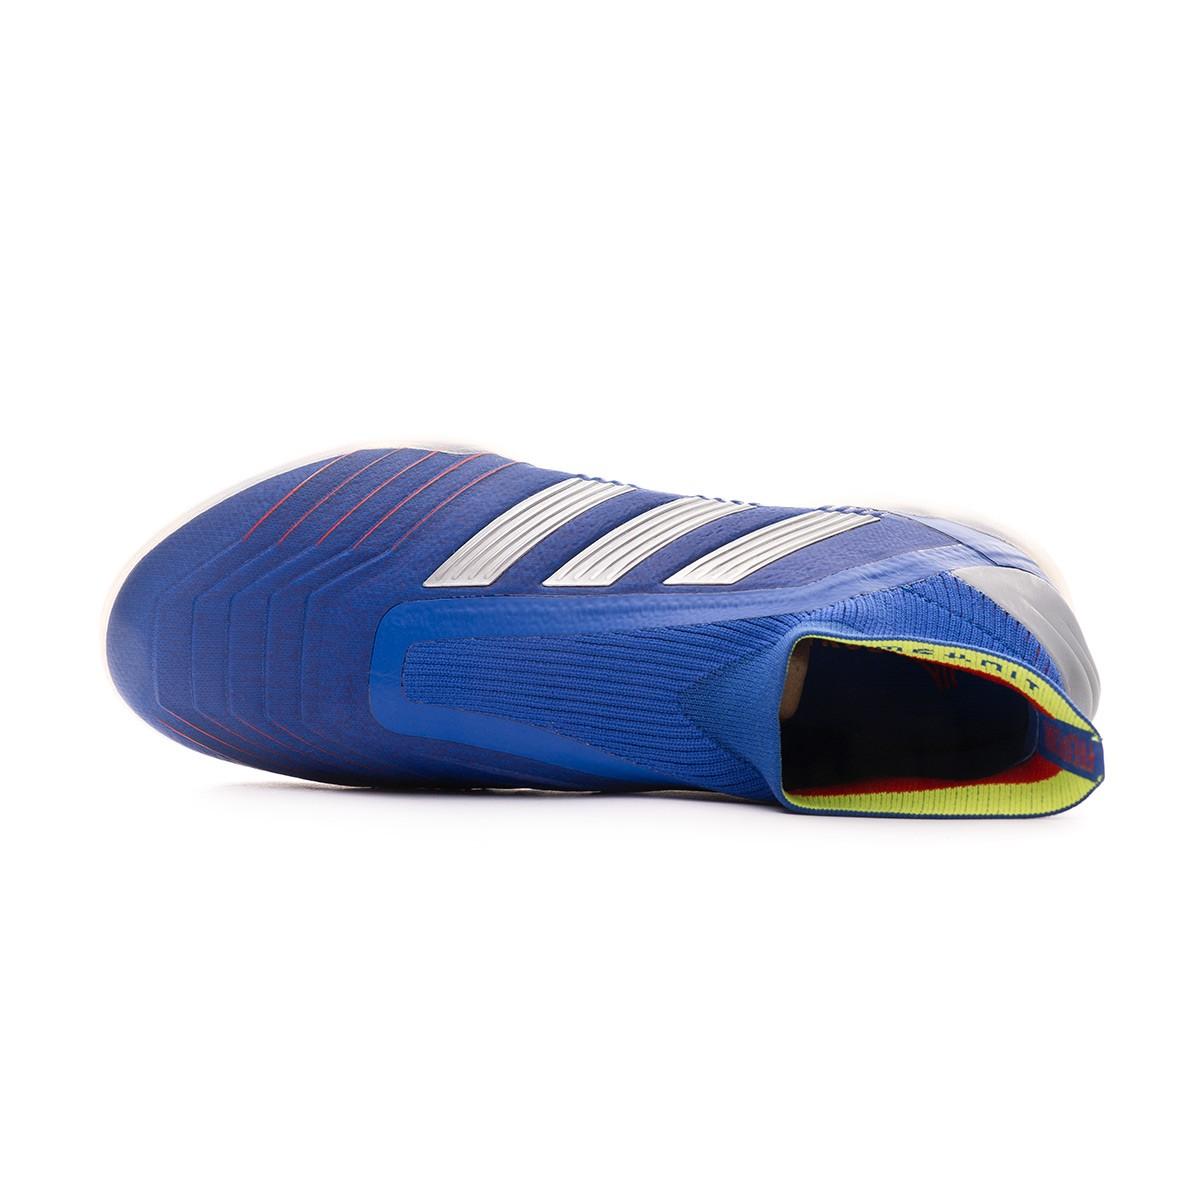 Football Boot adidas Predator Tango 19+